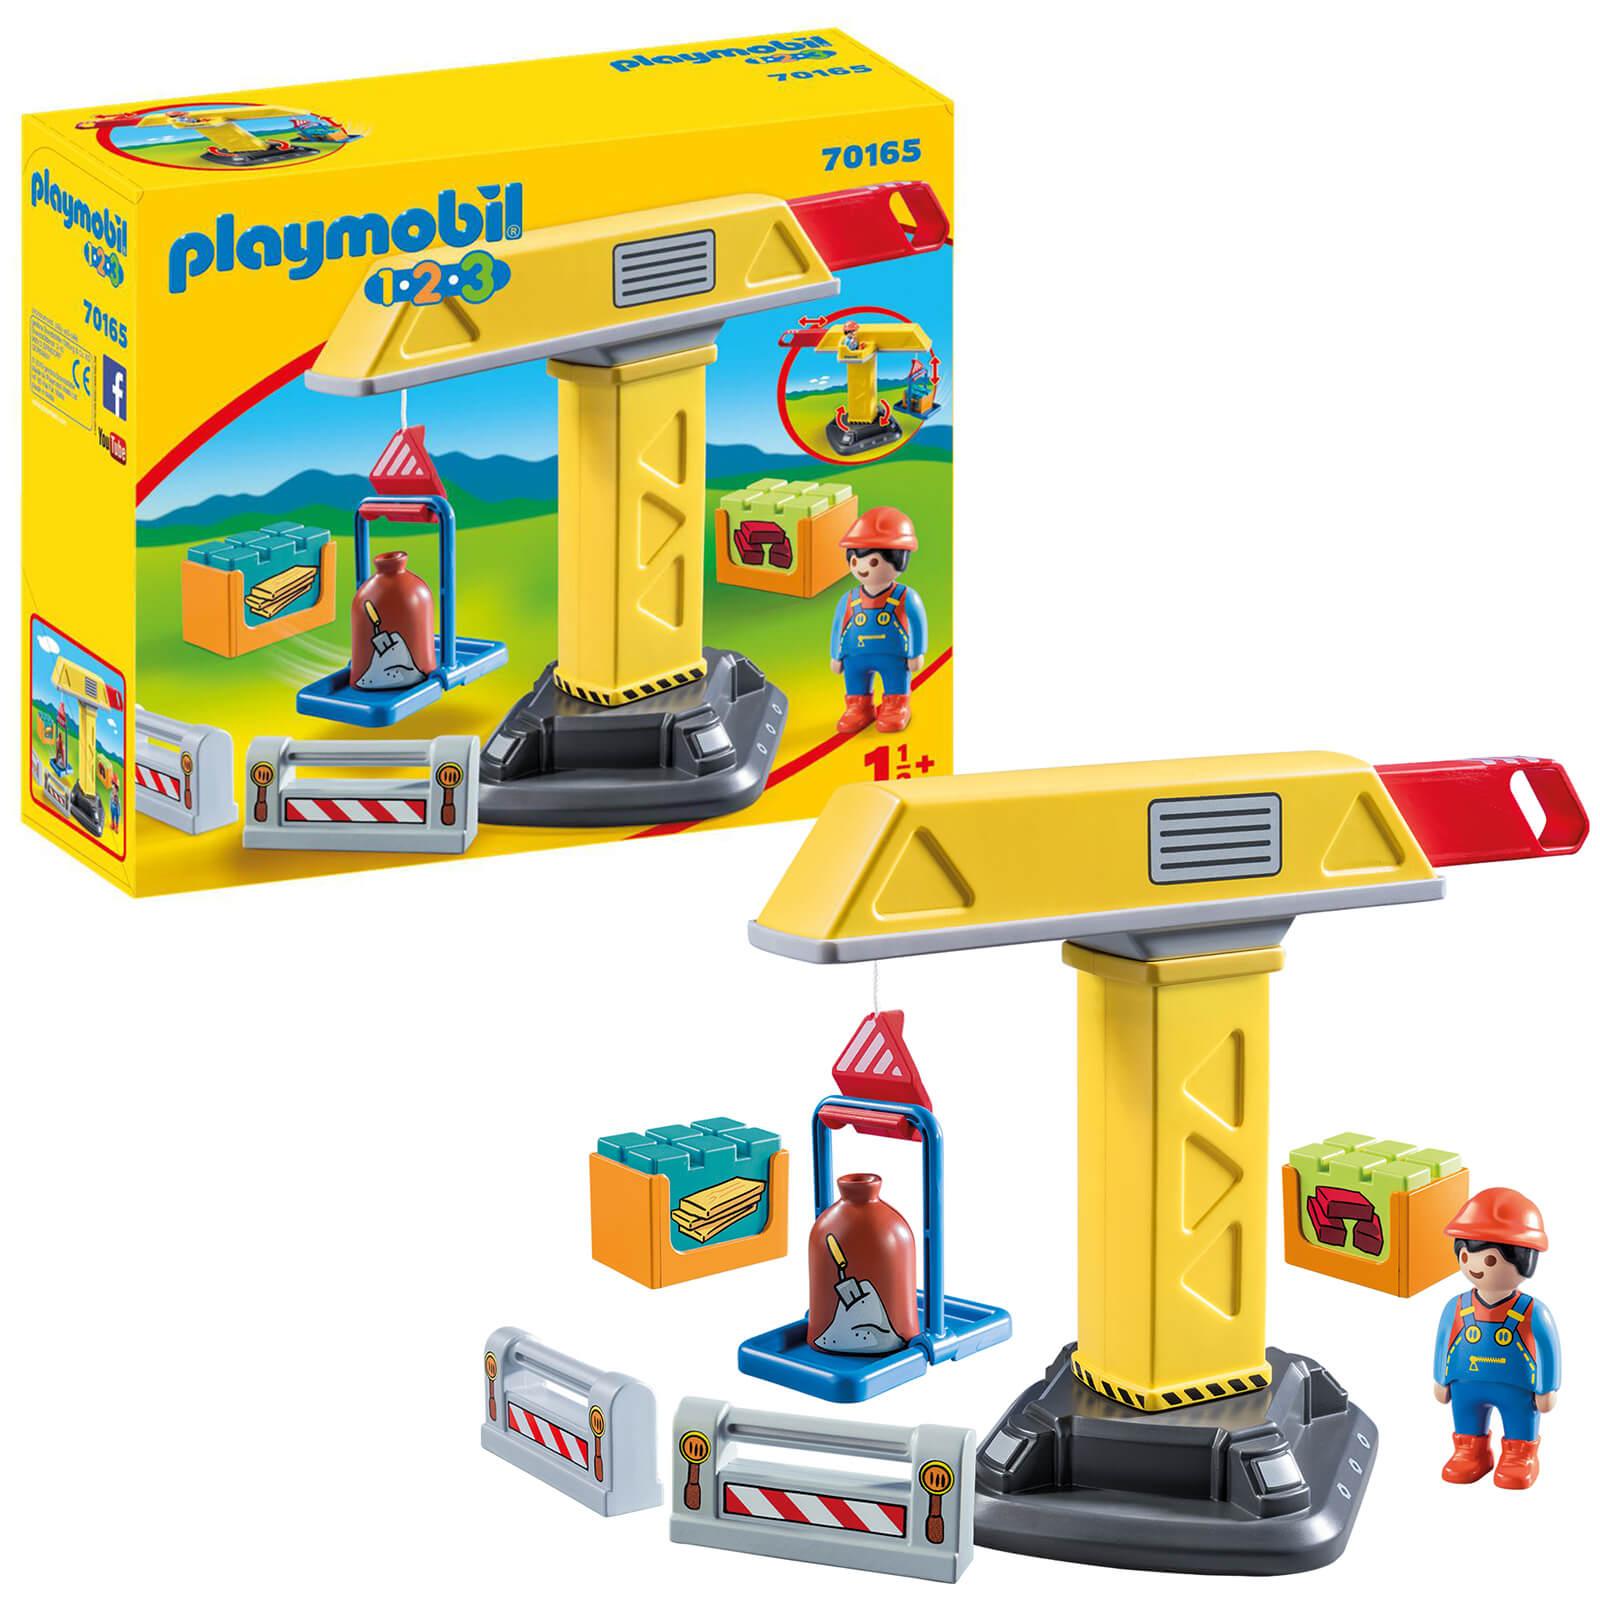 Playmobil 1.2.3 Construction Crane For Children 18 Months+ (70165)